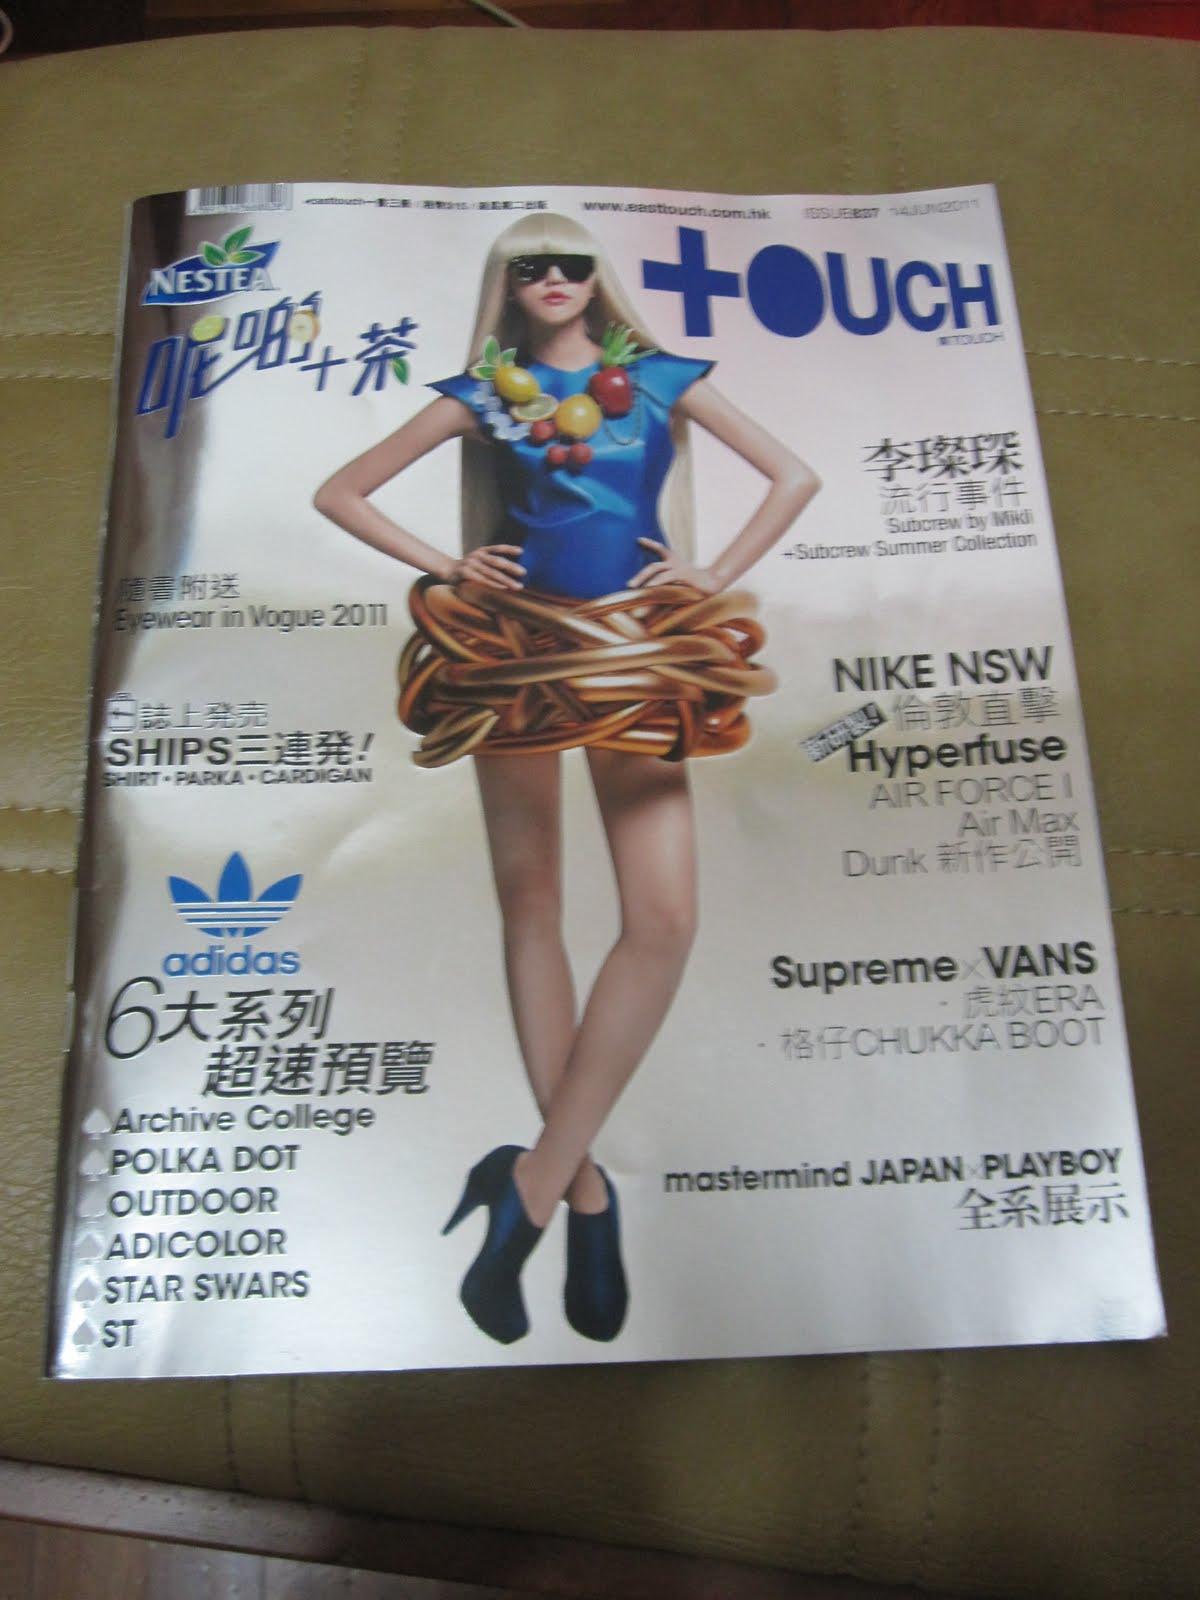 Anything is Marketing: 雀巢檸檬茶「呢啲+茶」廣告